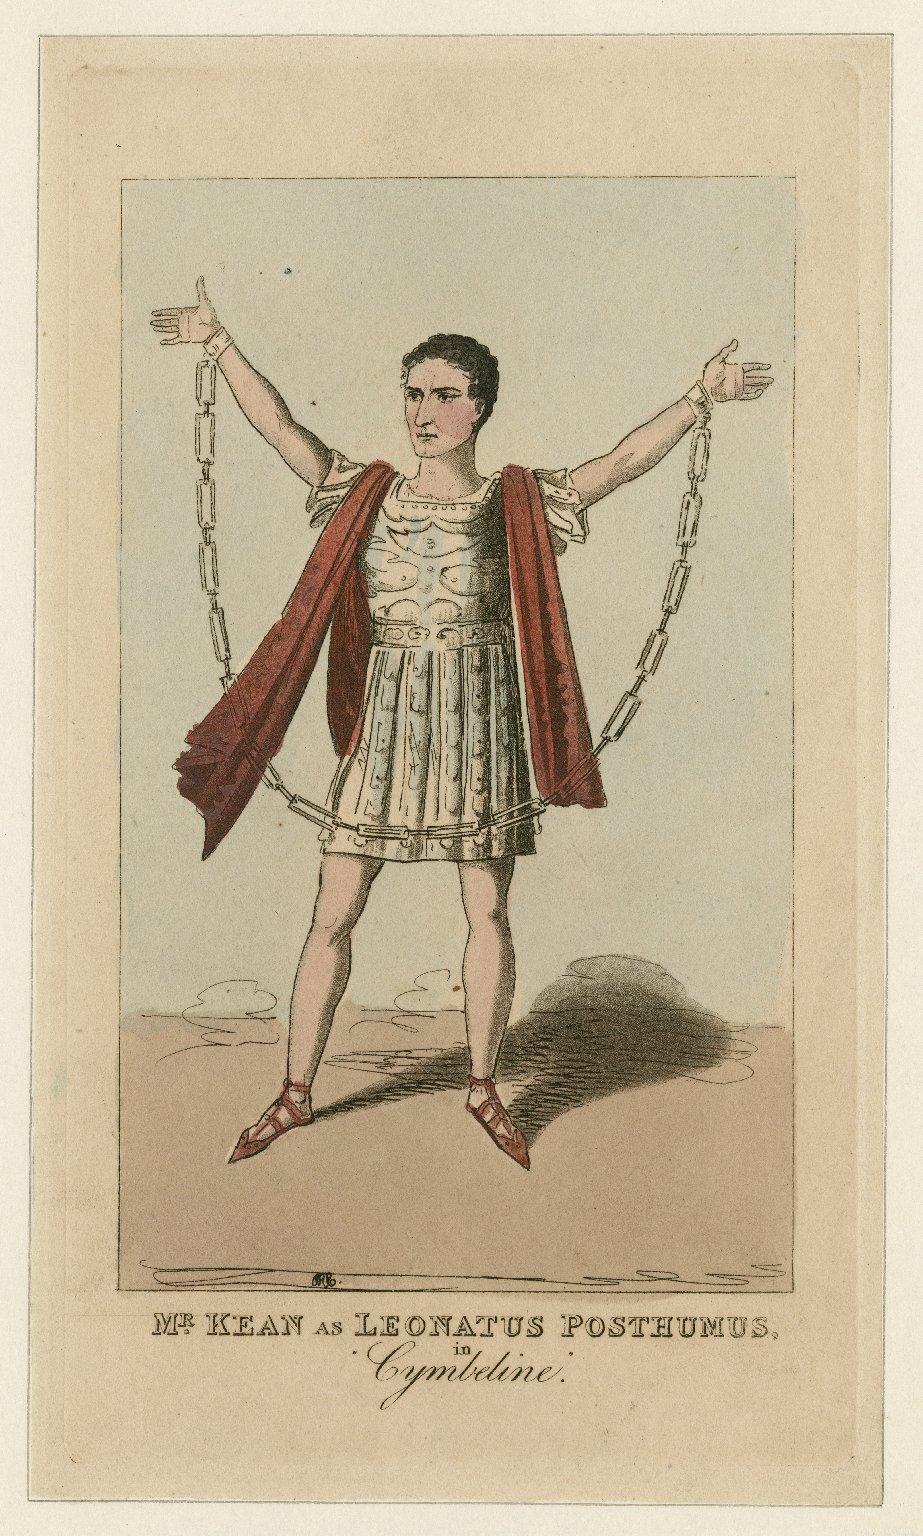 Mr. Kean as Leonatus Posthumus in Cymbeline [by Shakespeare] [graphic] / IRC [fecit].